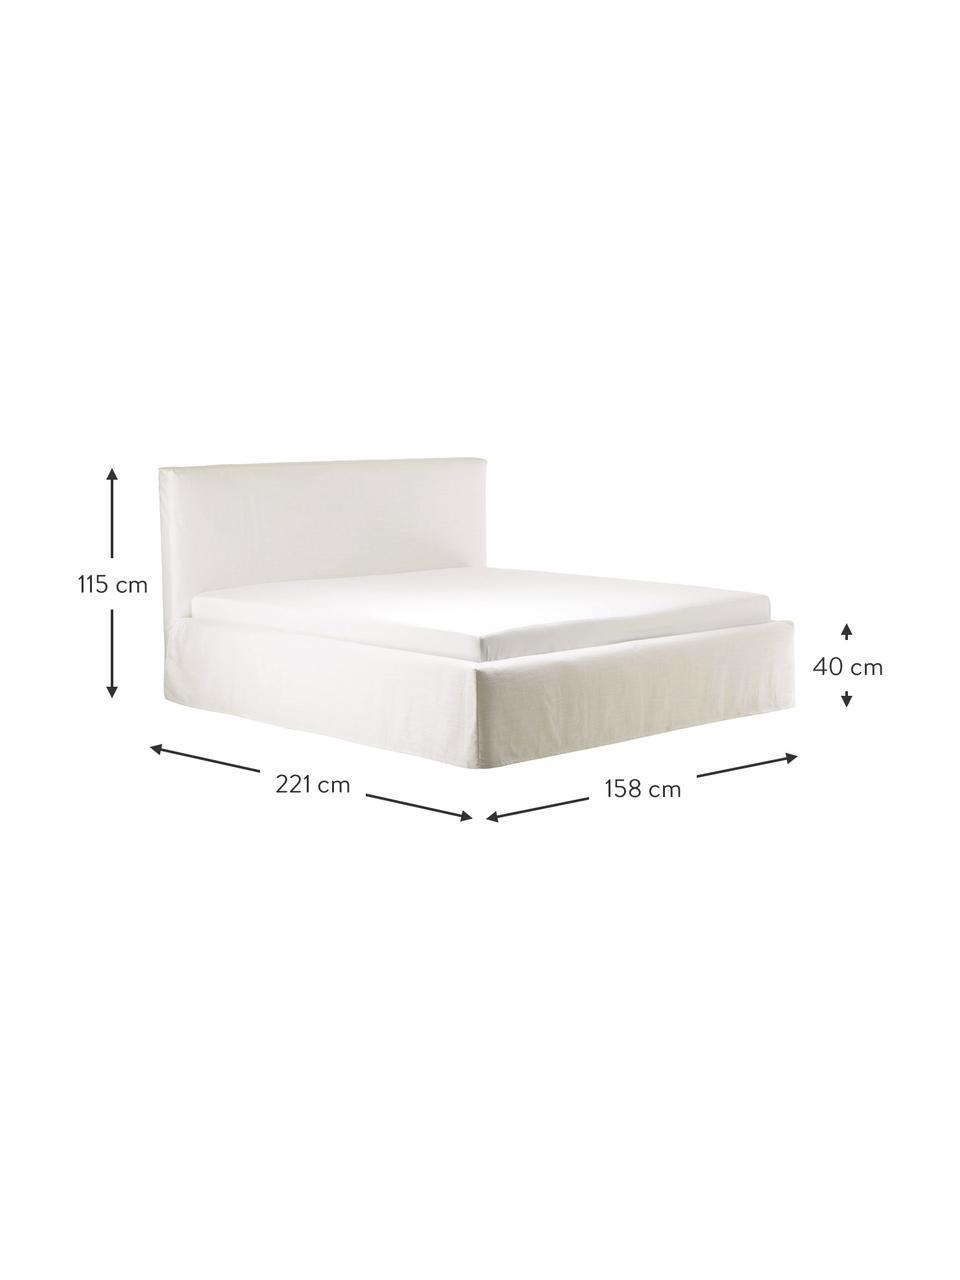 Beige gestoffeerd bed Feather met opbergruimte, Frame: massief grenenhout en pla, Bekleding: polyester (structuurmater, Geweven stof ecru, 180 x 200 cm